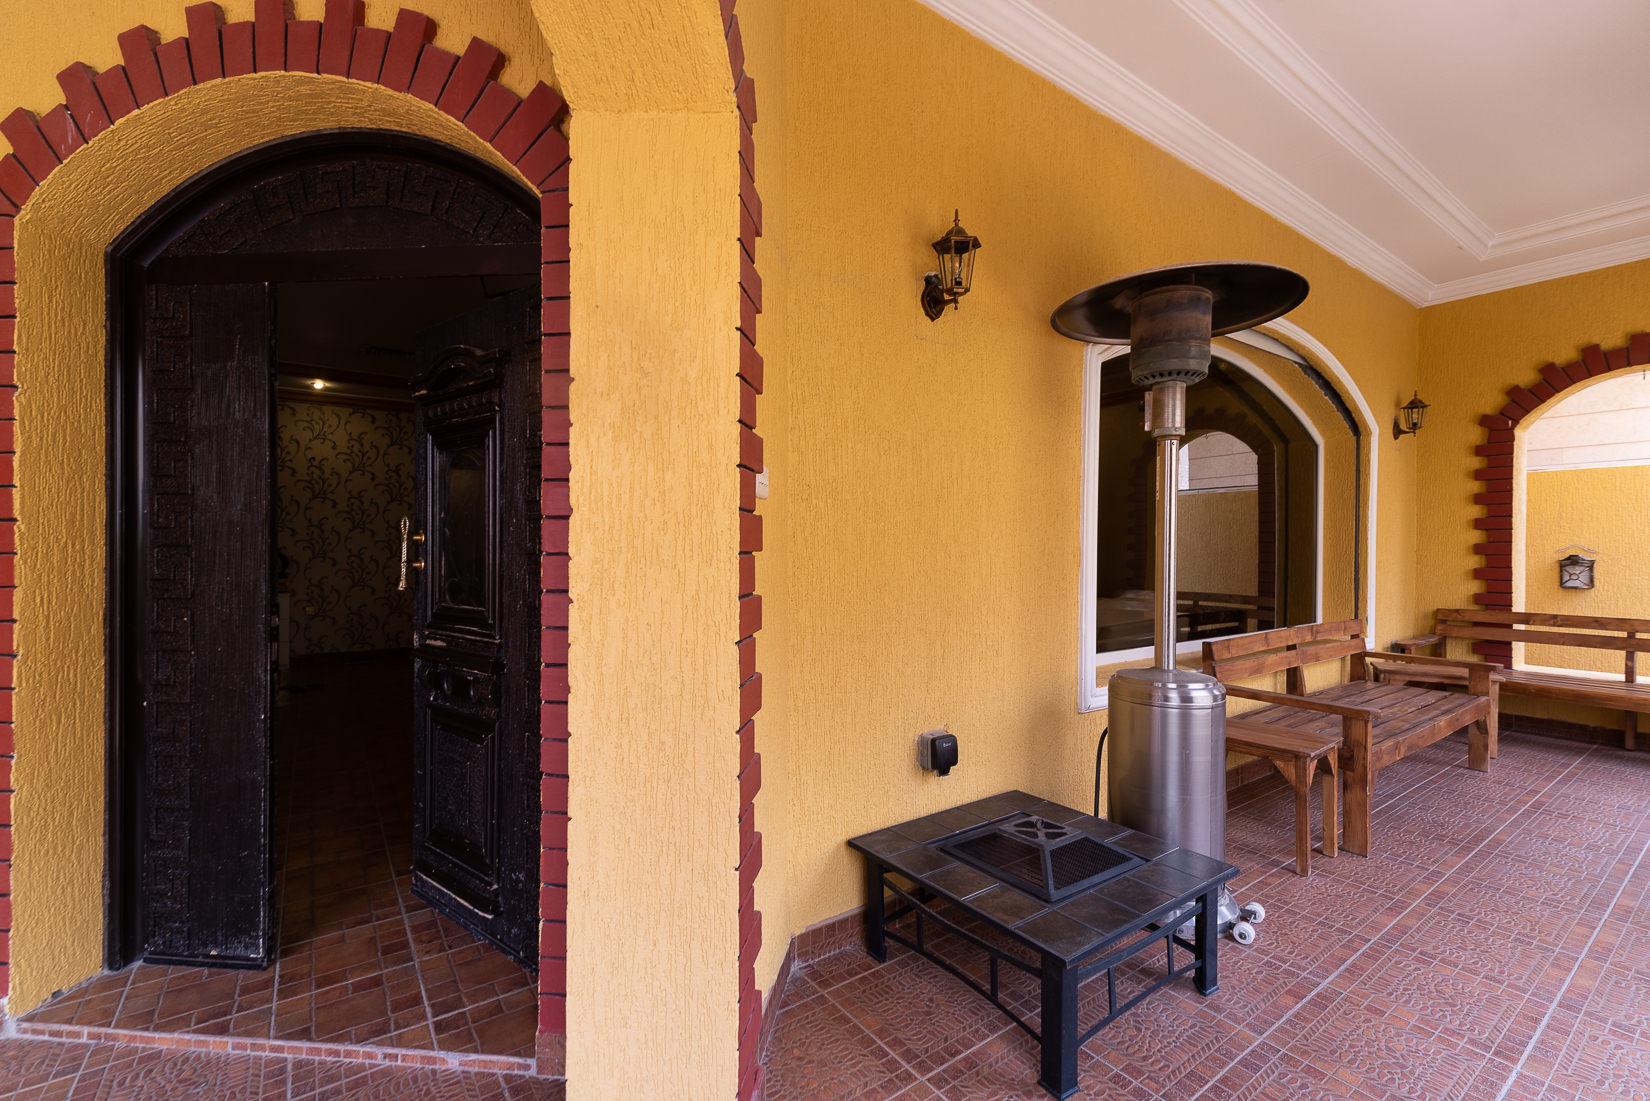 Abdulla Al Mubarak – unfurnished, four bedroom villa w/garden